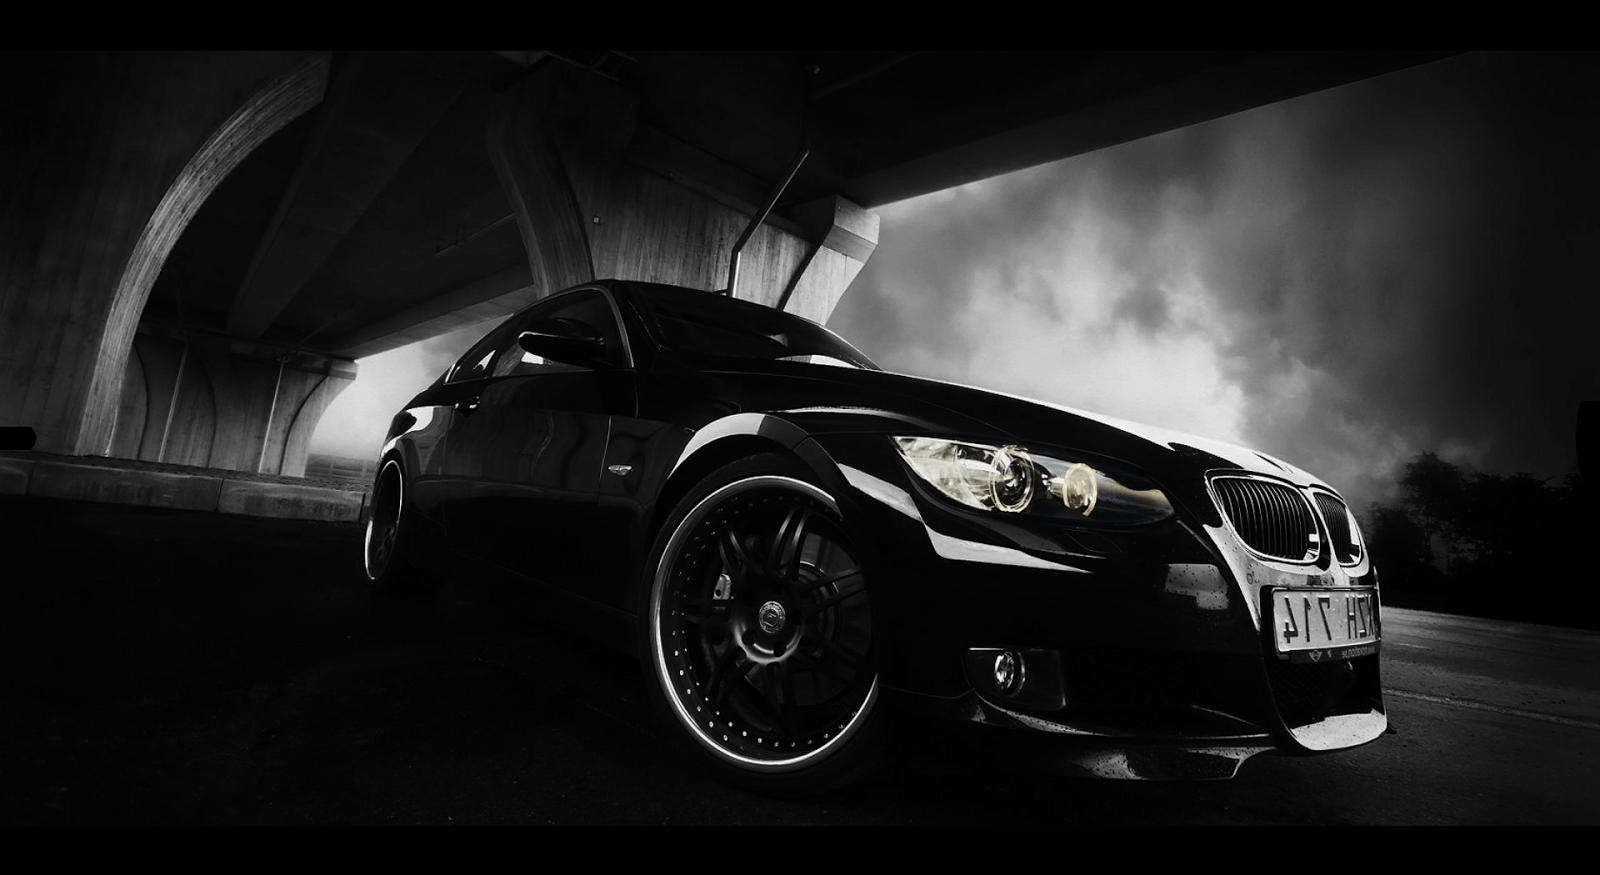 Black BMW Wallpapers - Wallpaper Cave